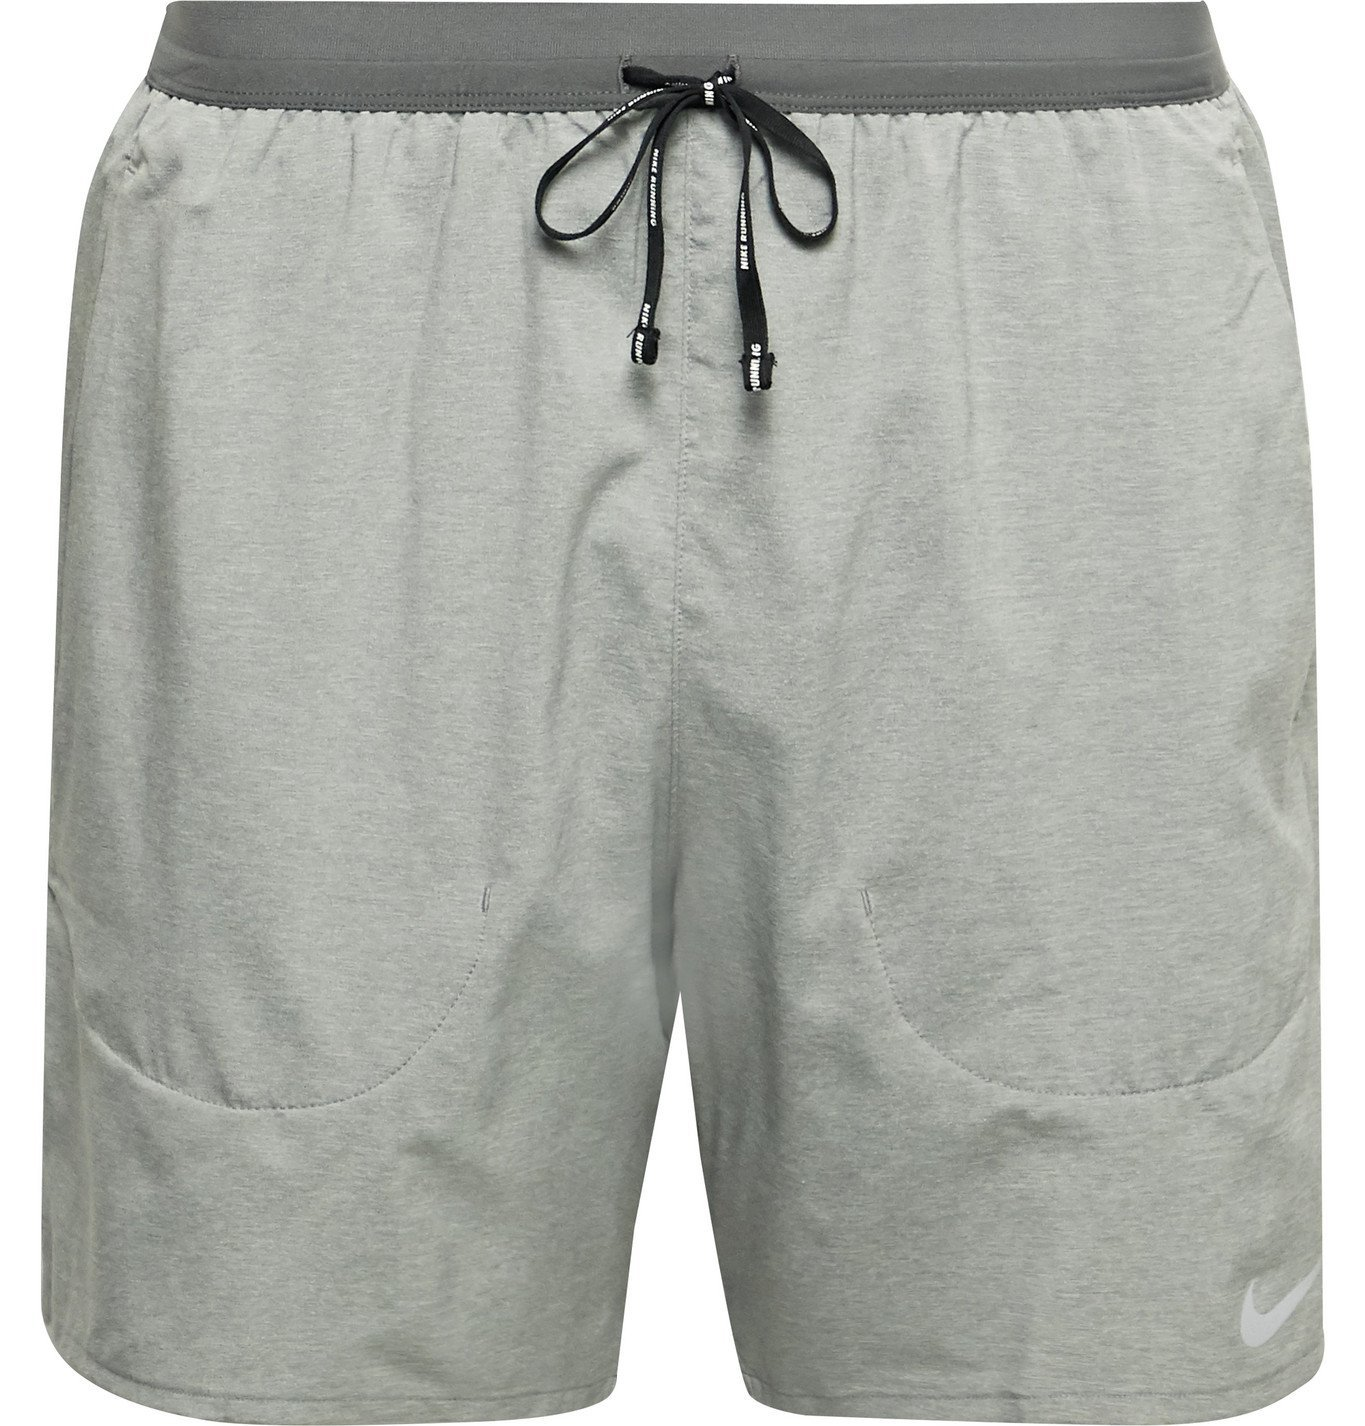 Nike Running - Flex Stride Slim-Fit Mélange Dri-FIT Shorts - Gray